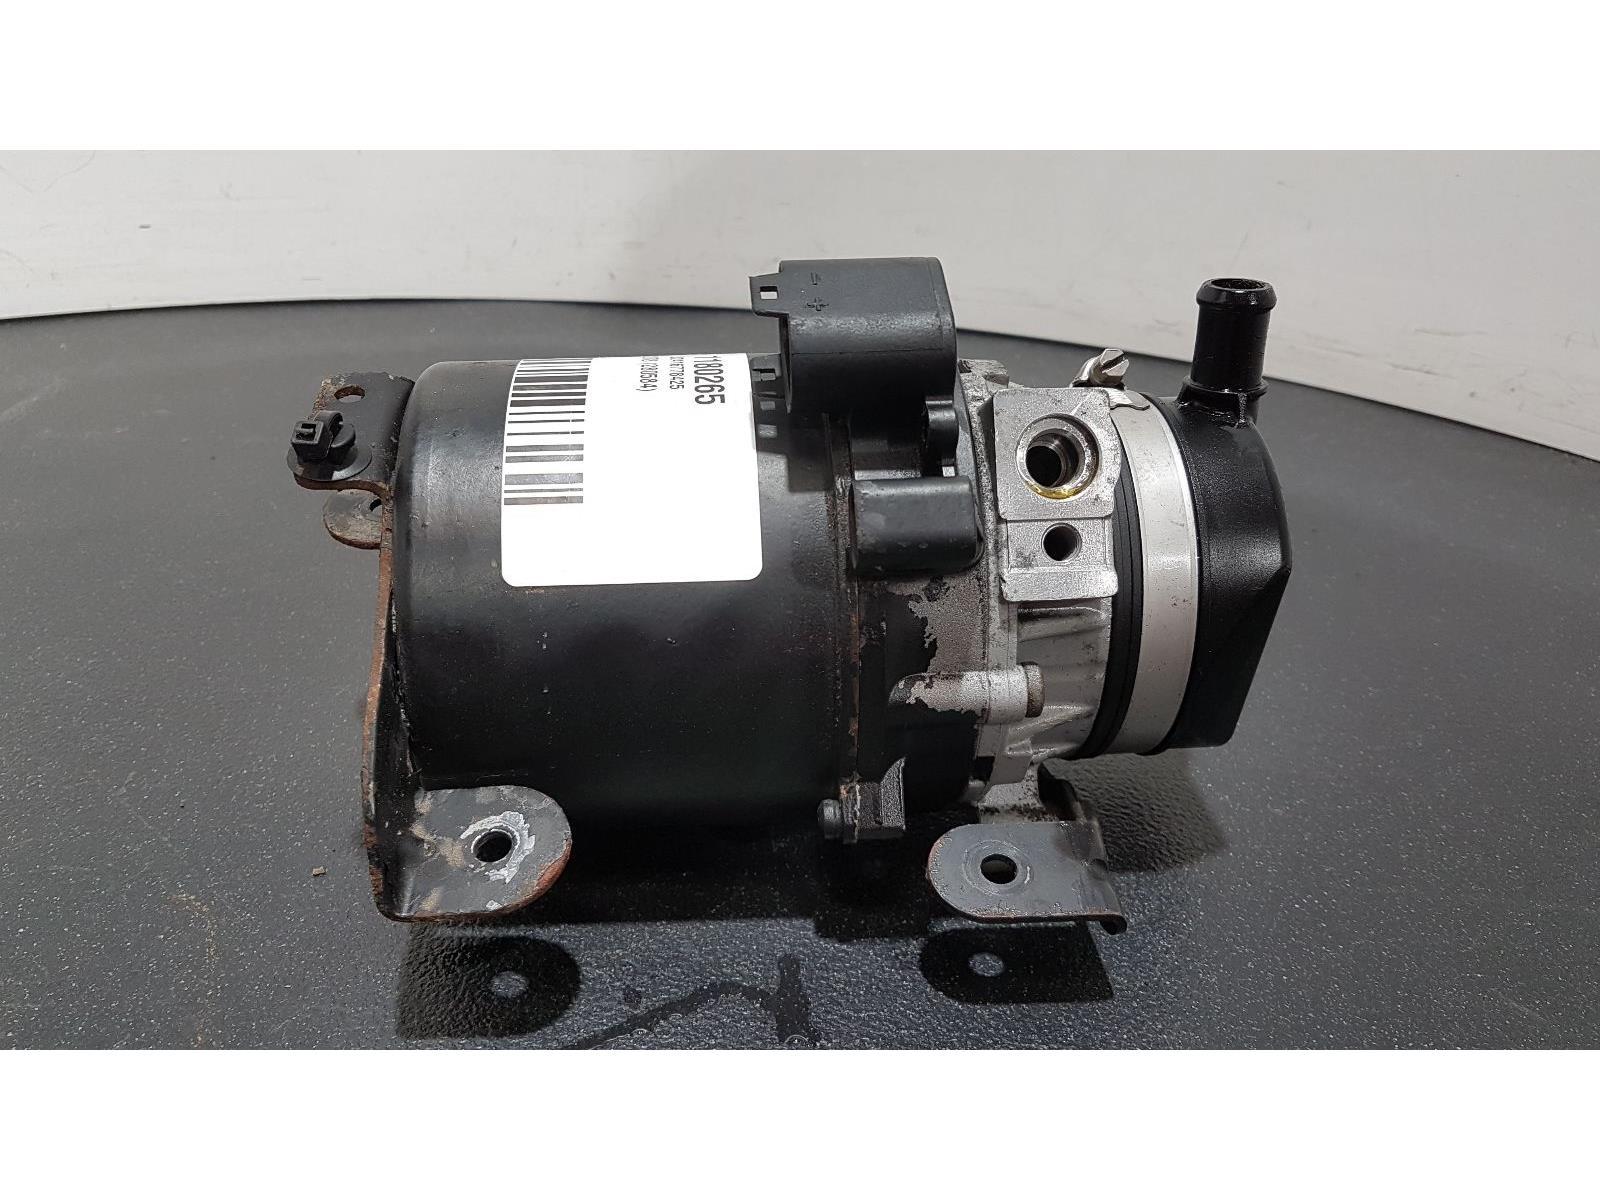 MINI Mini 2001 To 2008 Power Steering Pump PAS Pump 32416778425